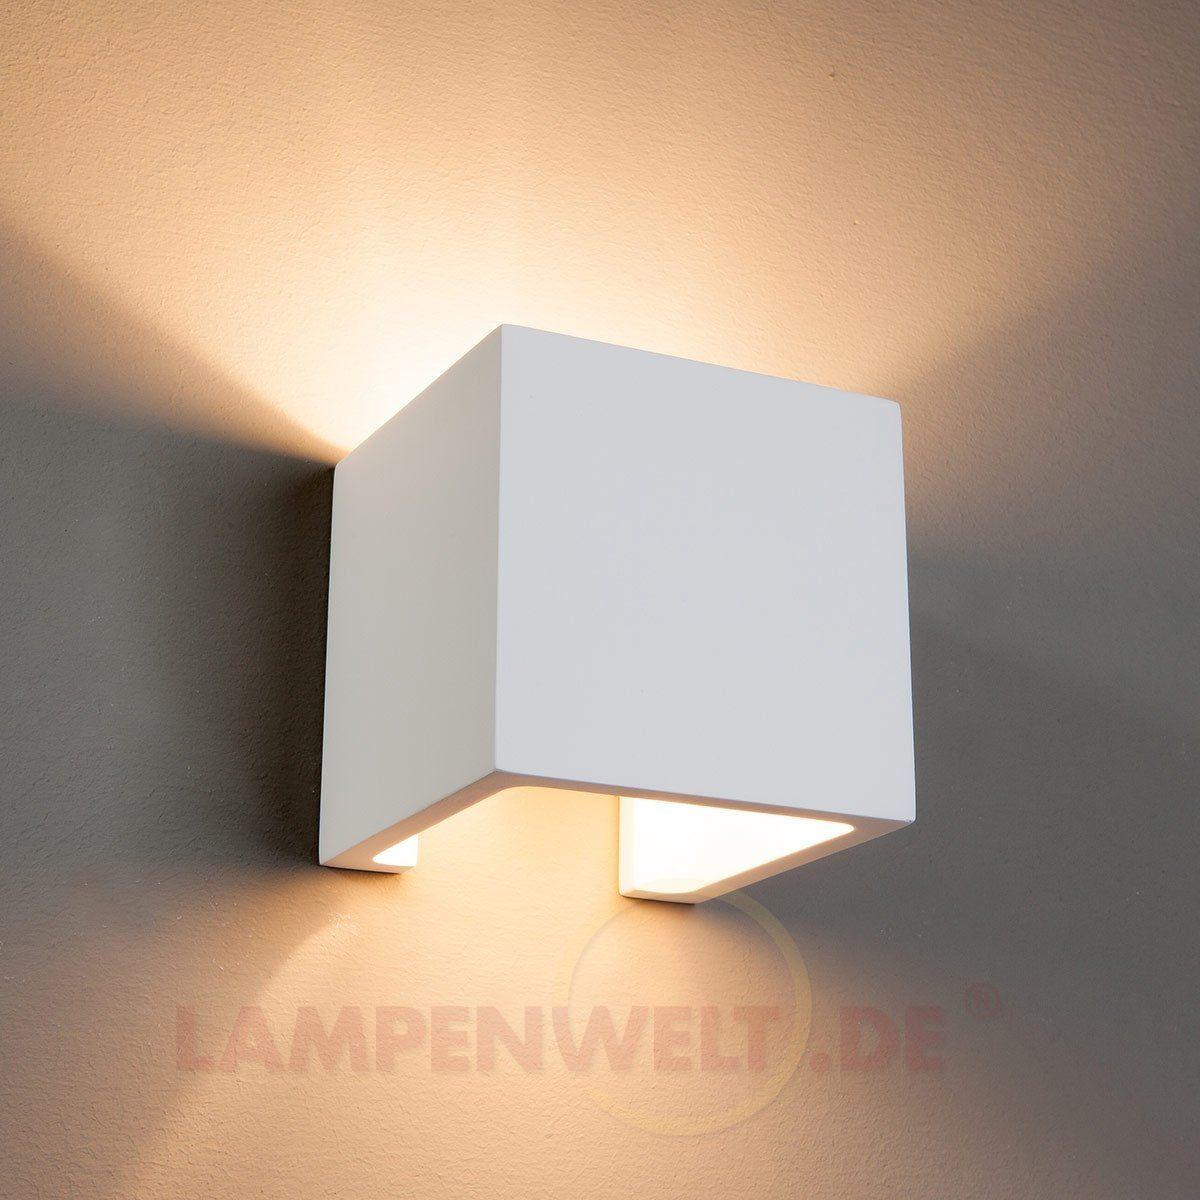 wandlampe indirekte beleuchtung style. Black Bedroom Furniture Sets. Home Design Ideas